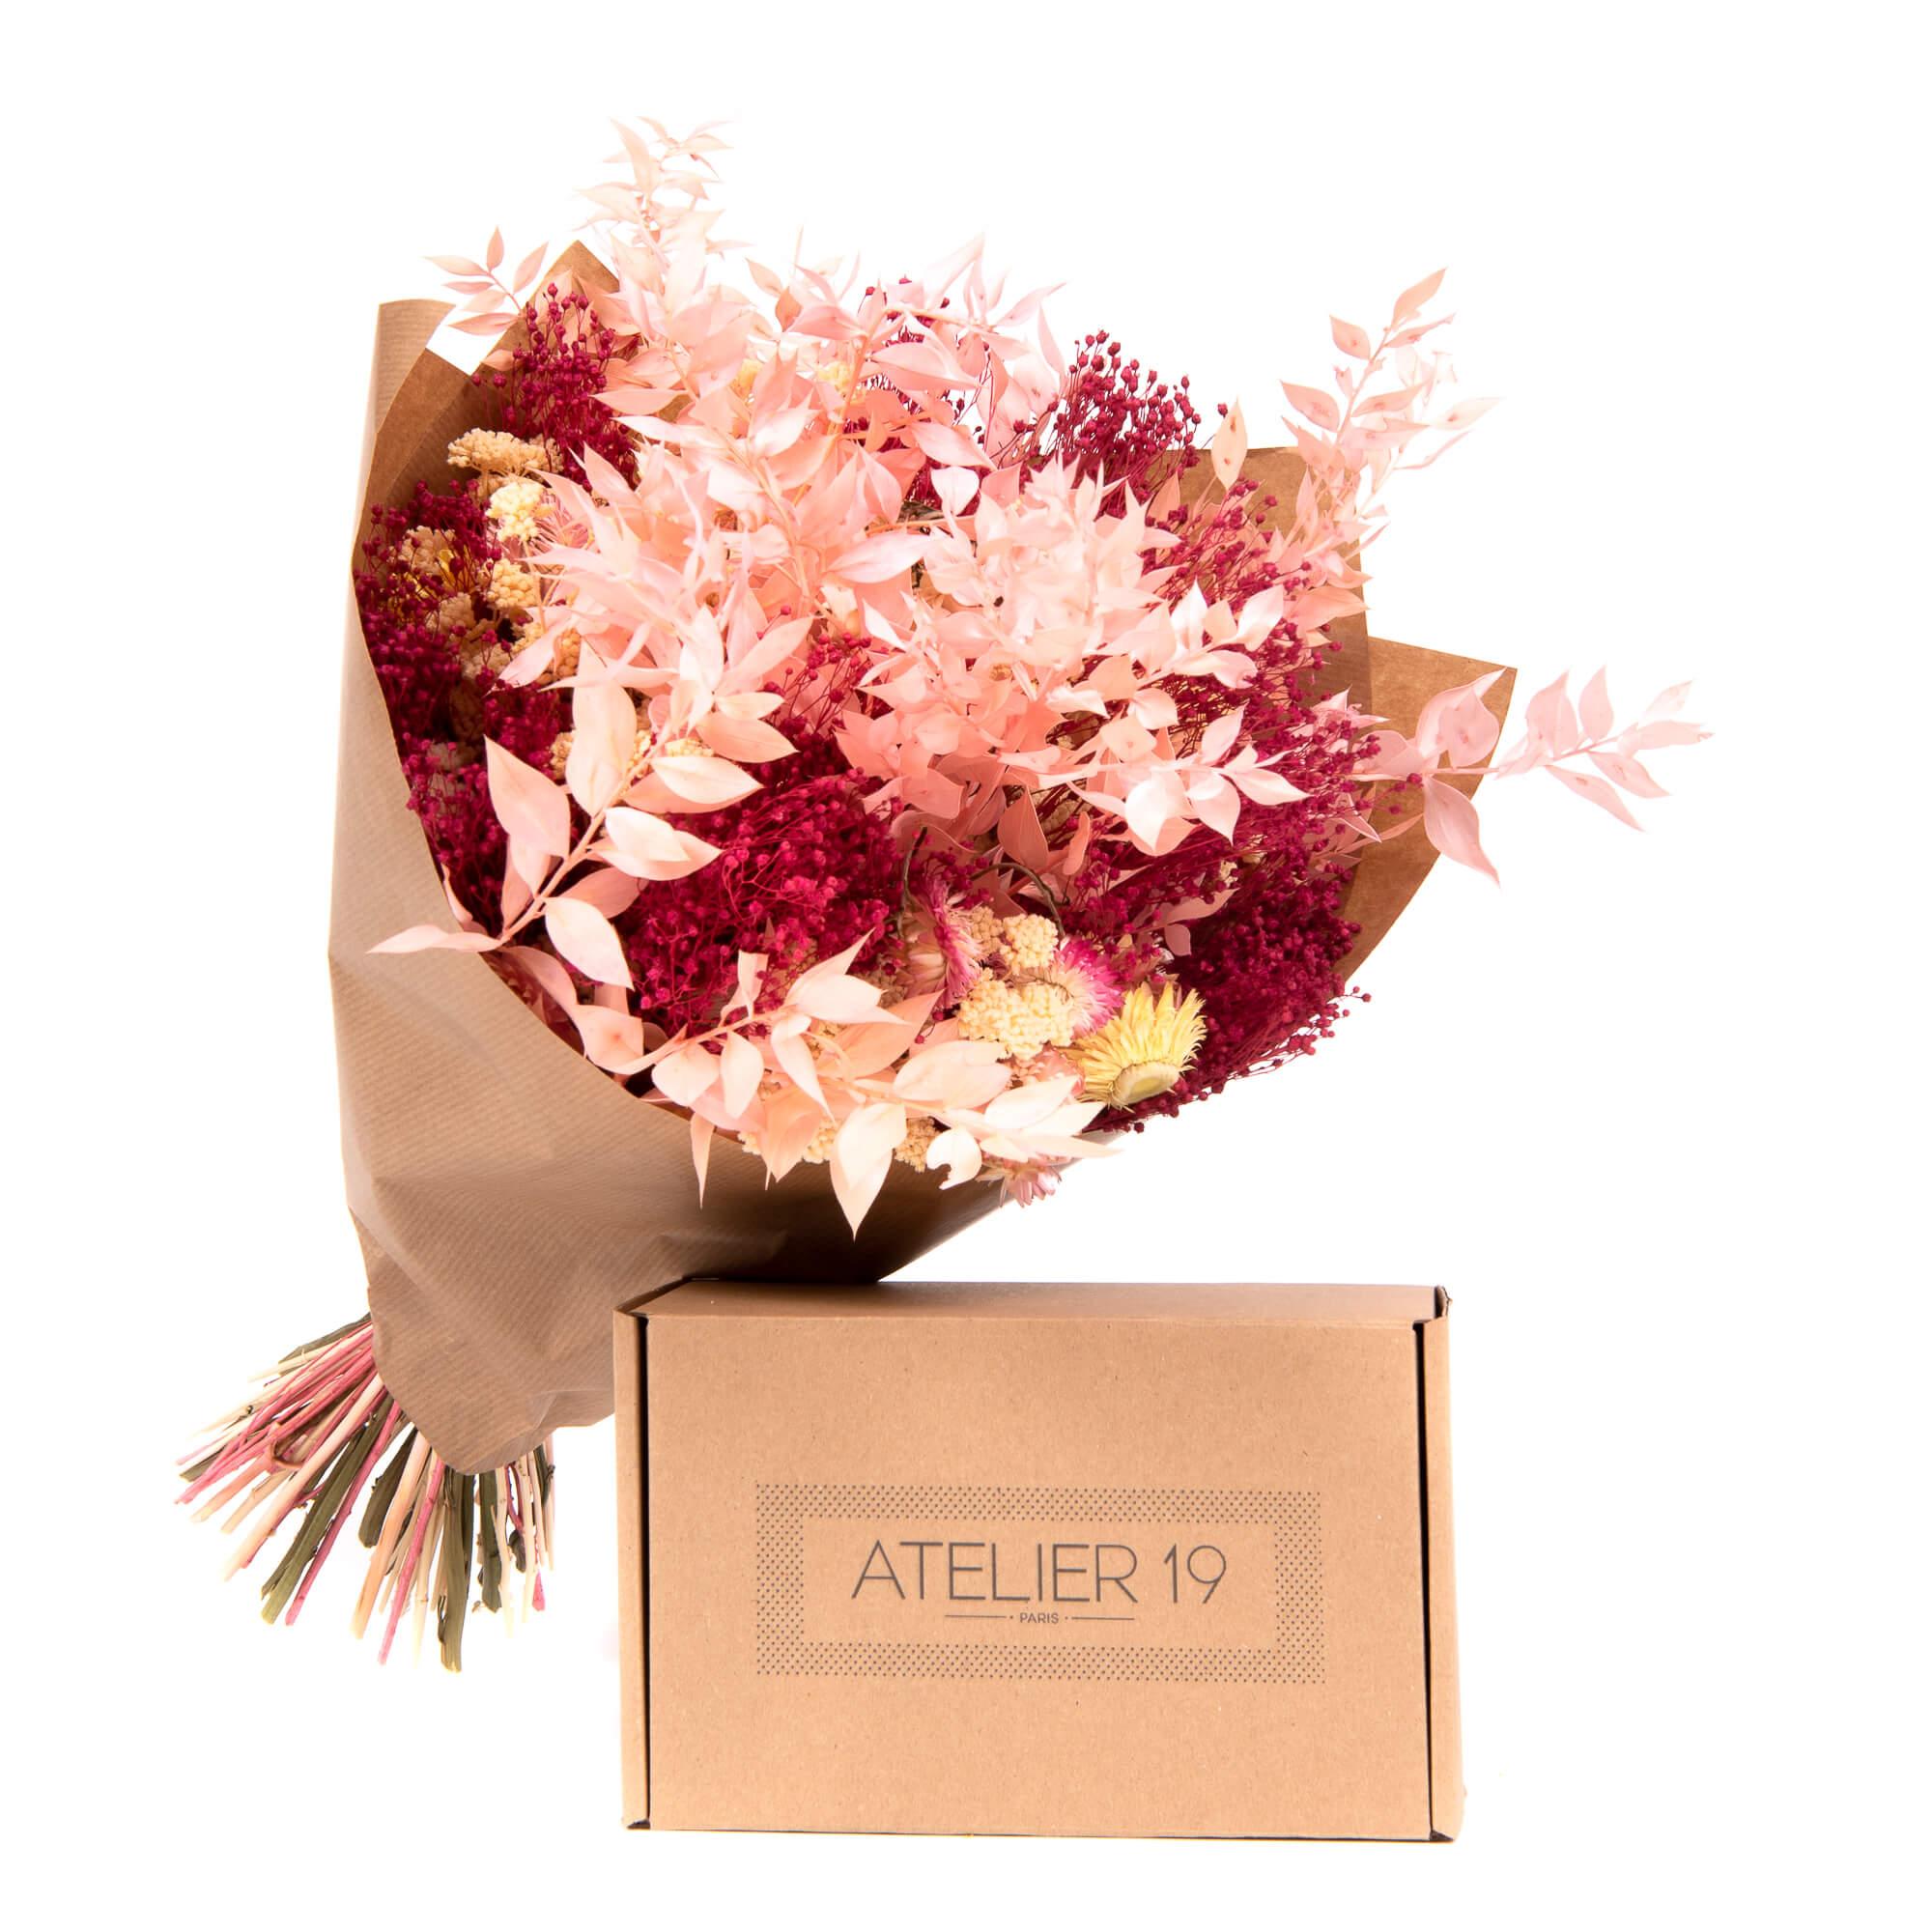 Un ramo de flores preparado por Atelier 19